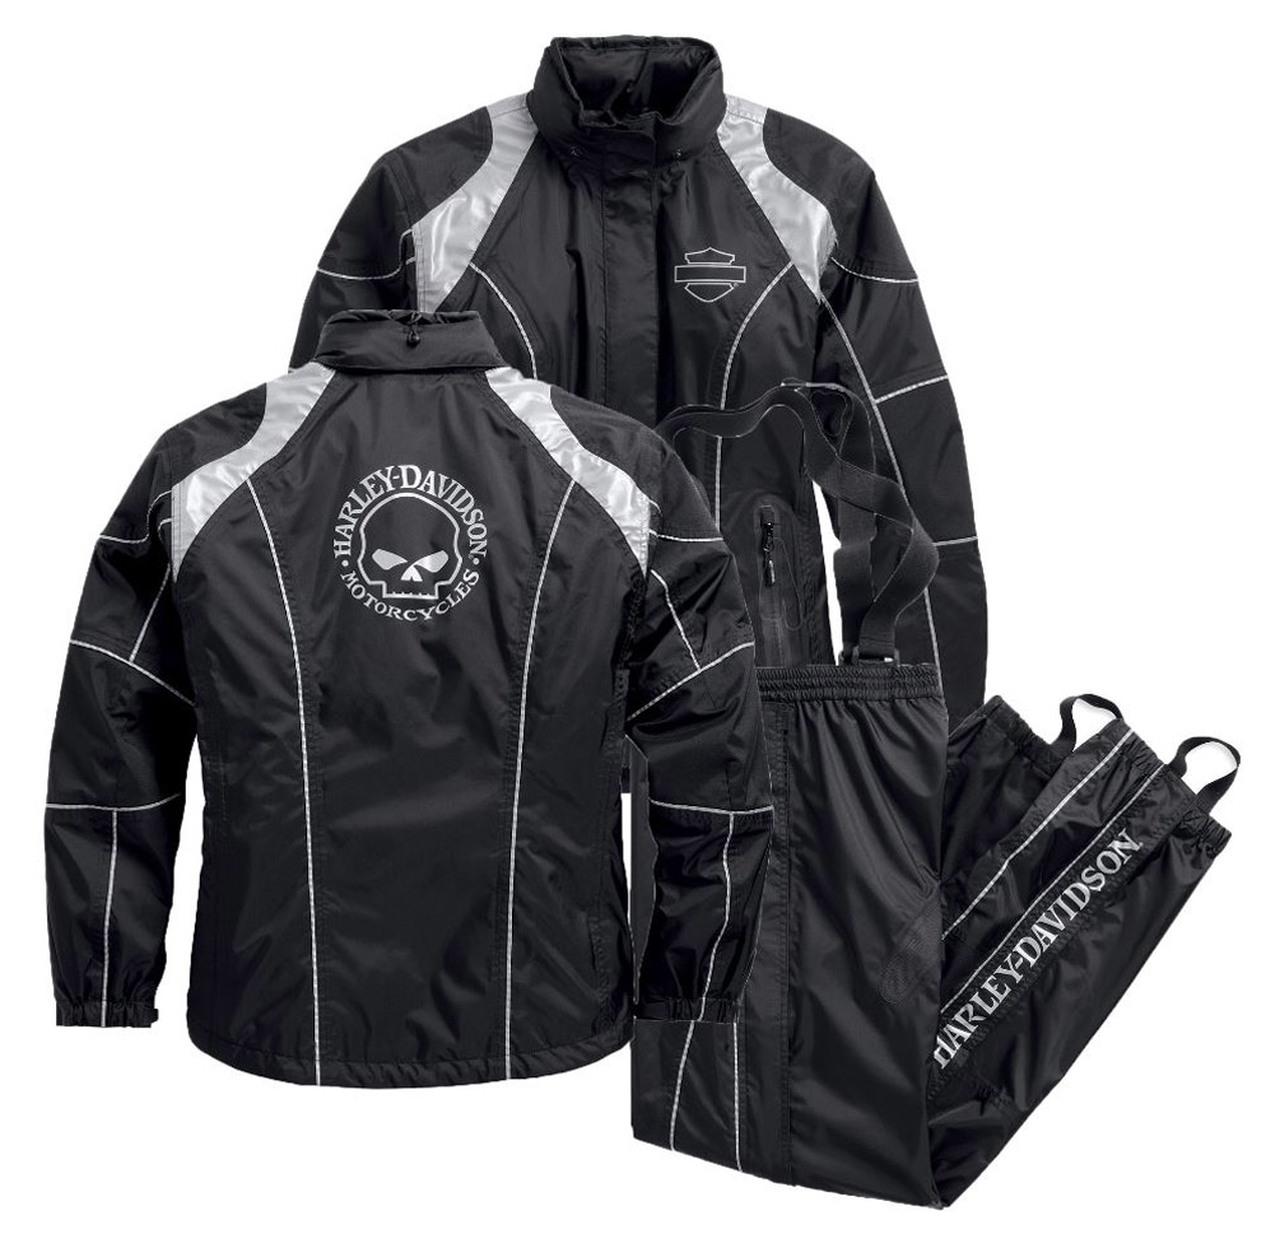 Harley-Davidson® Women's Rain Suit, Willie G. Skull Rain Gear, Black